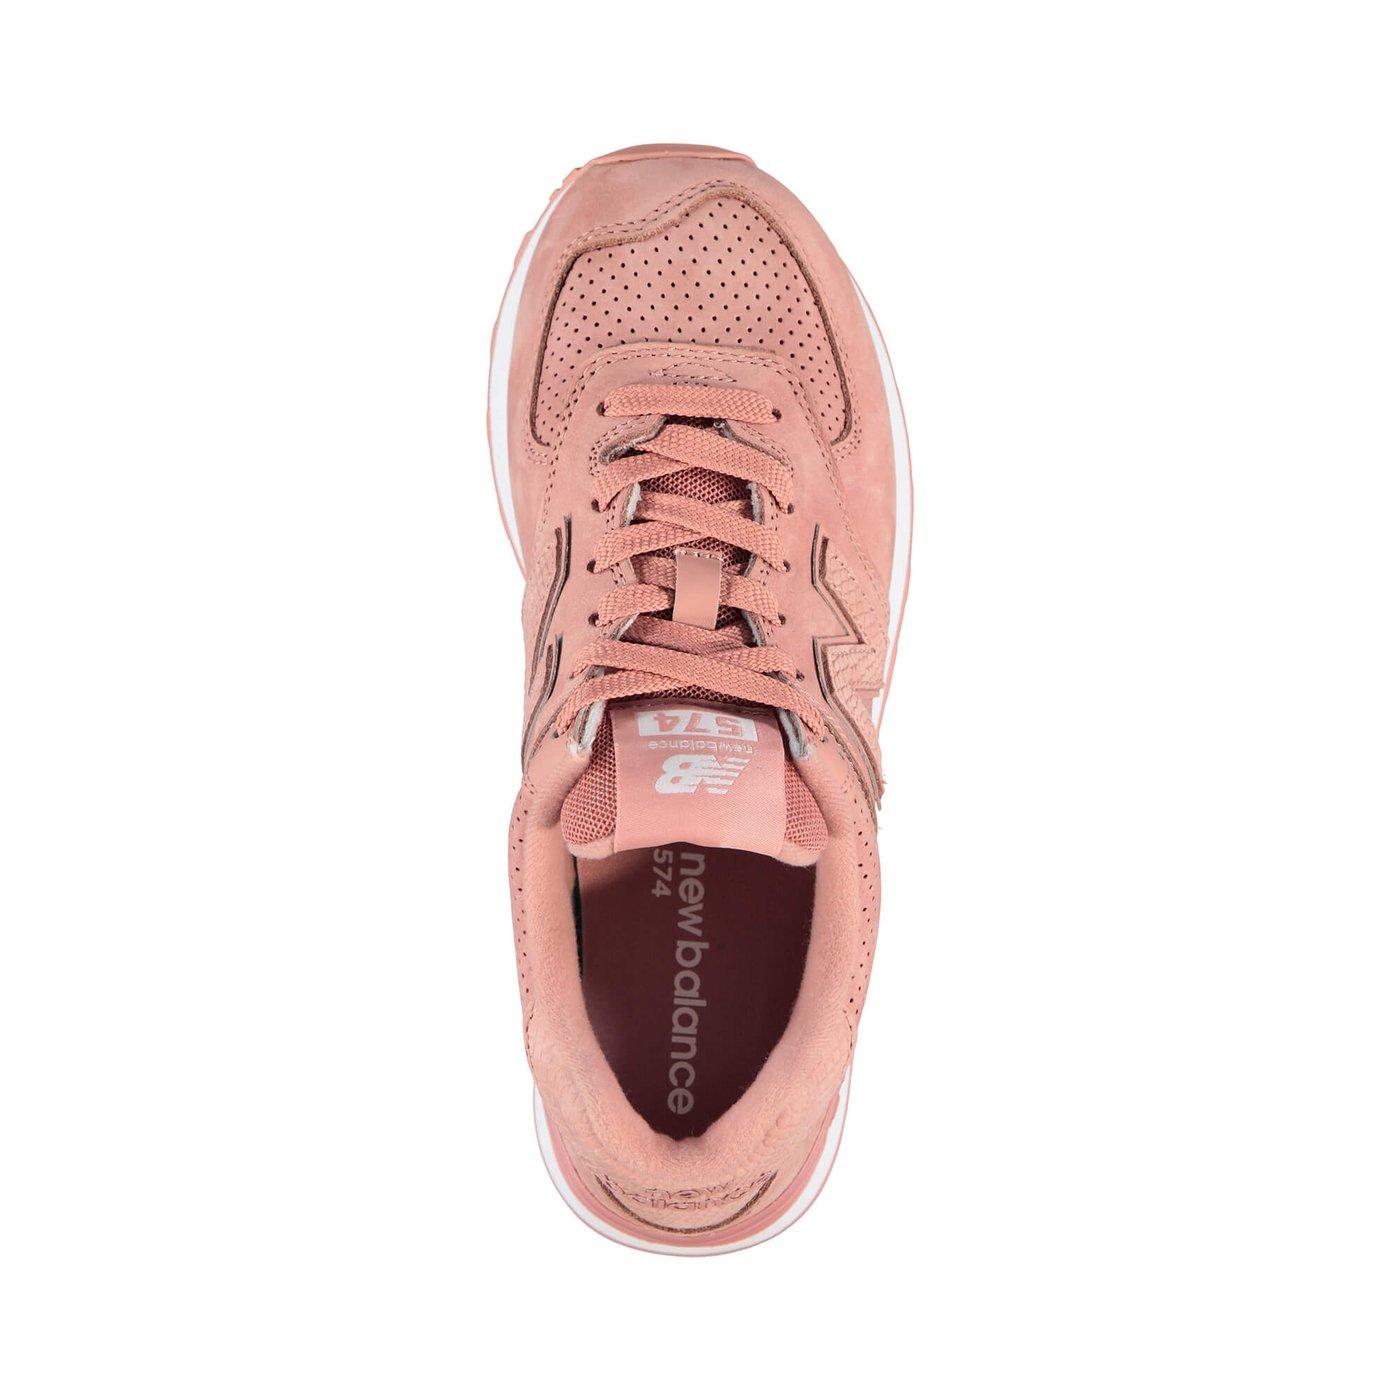 New Balance 574 Serp Luxe Kadın Pembe Sneaker